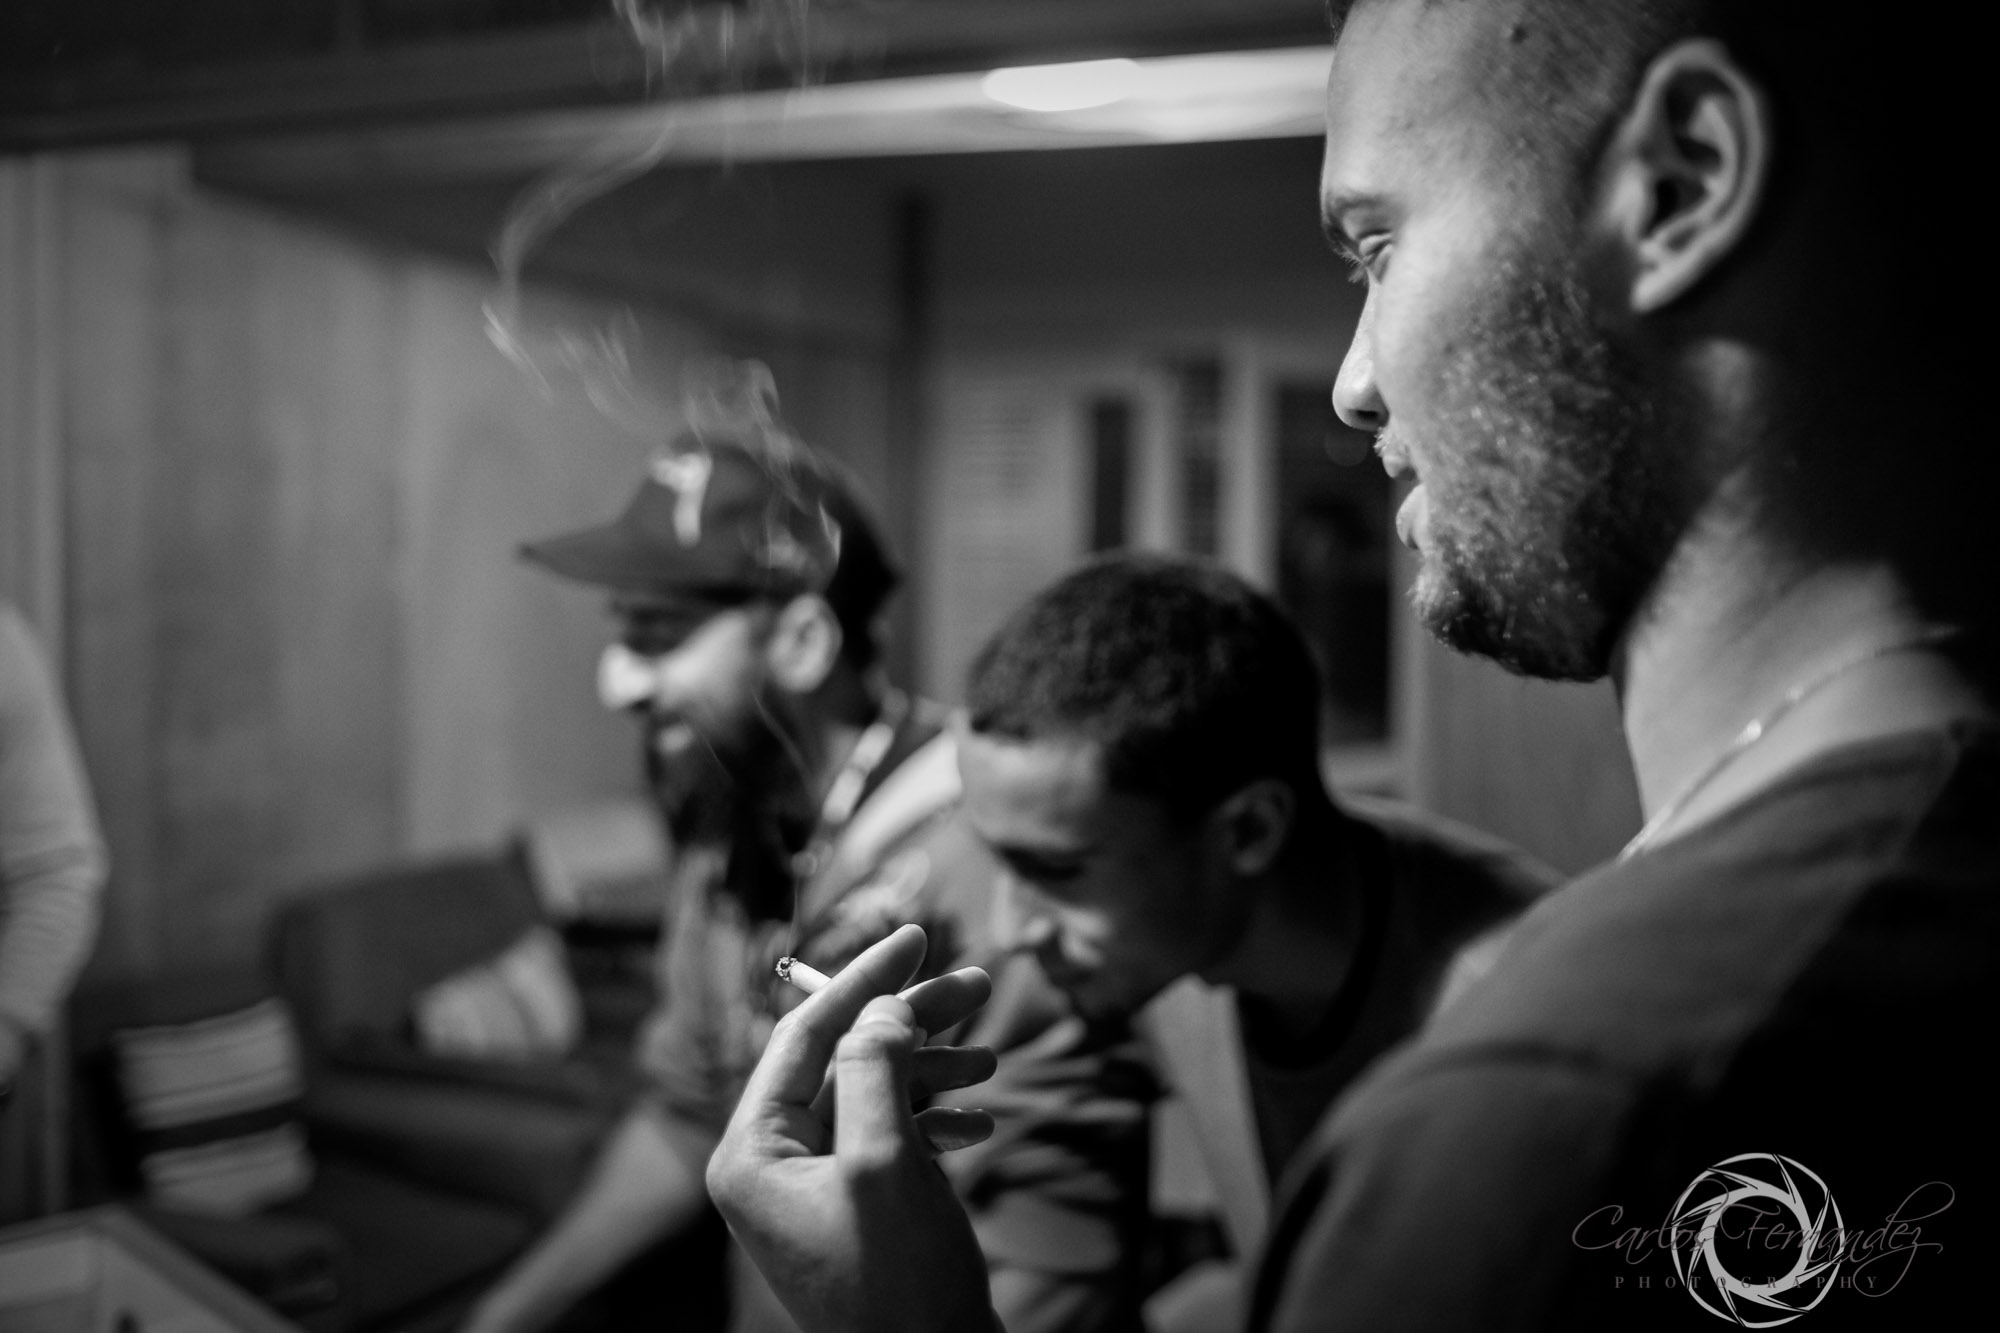 Smoke Trails on Long Street - 227/365